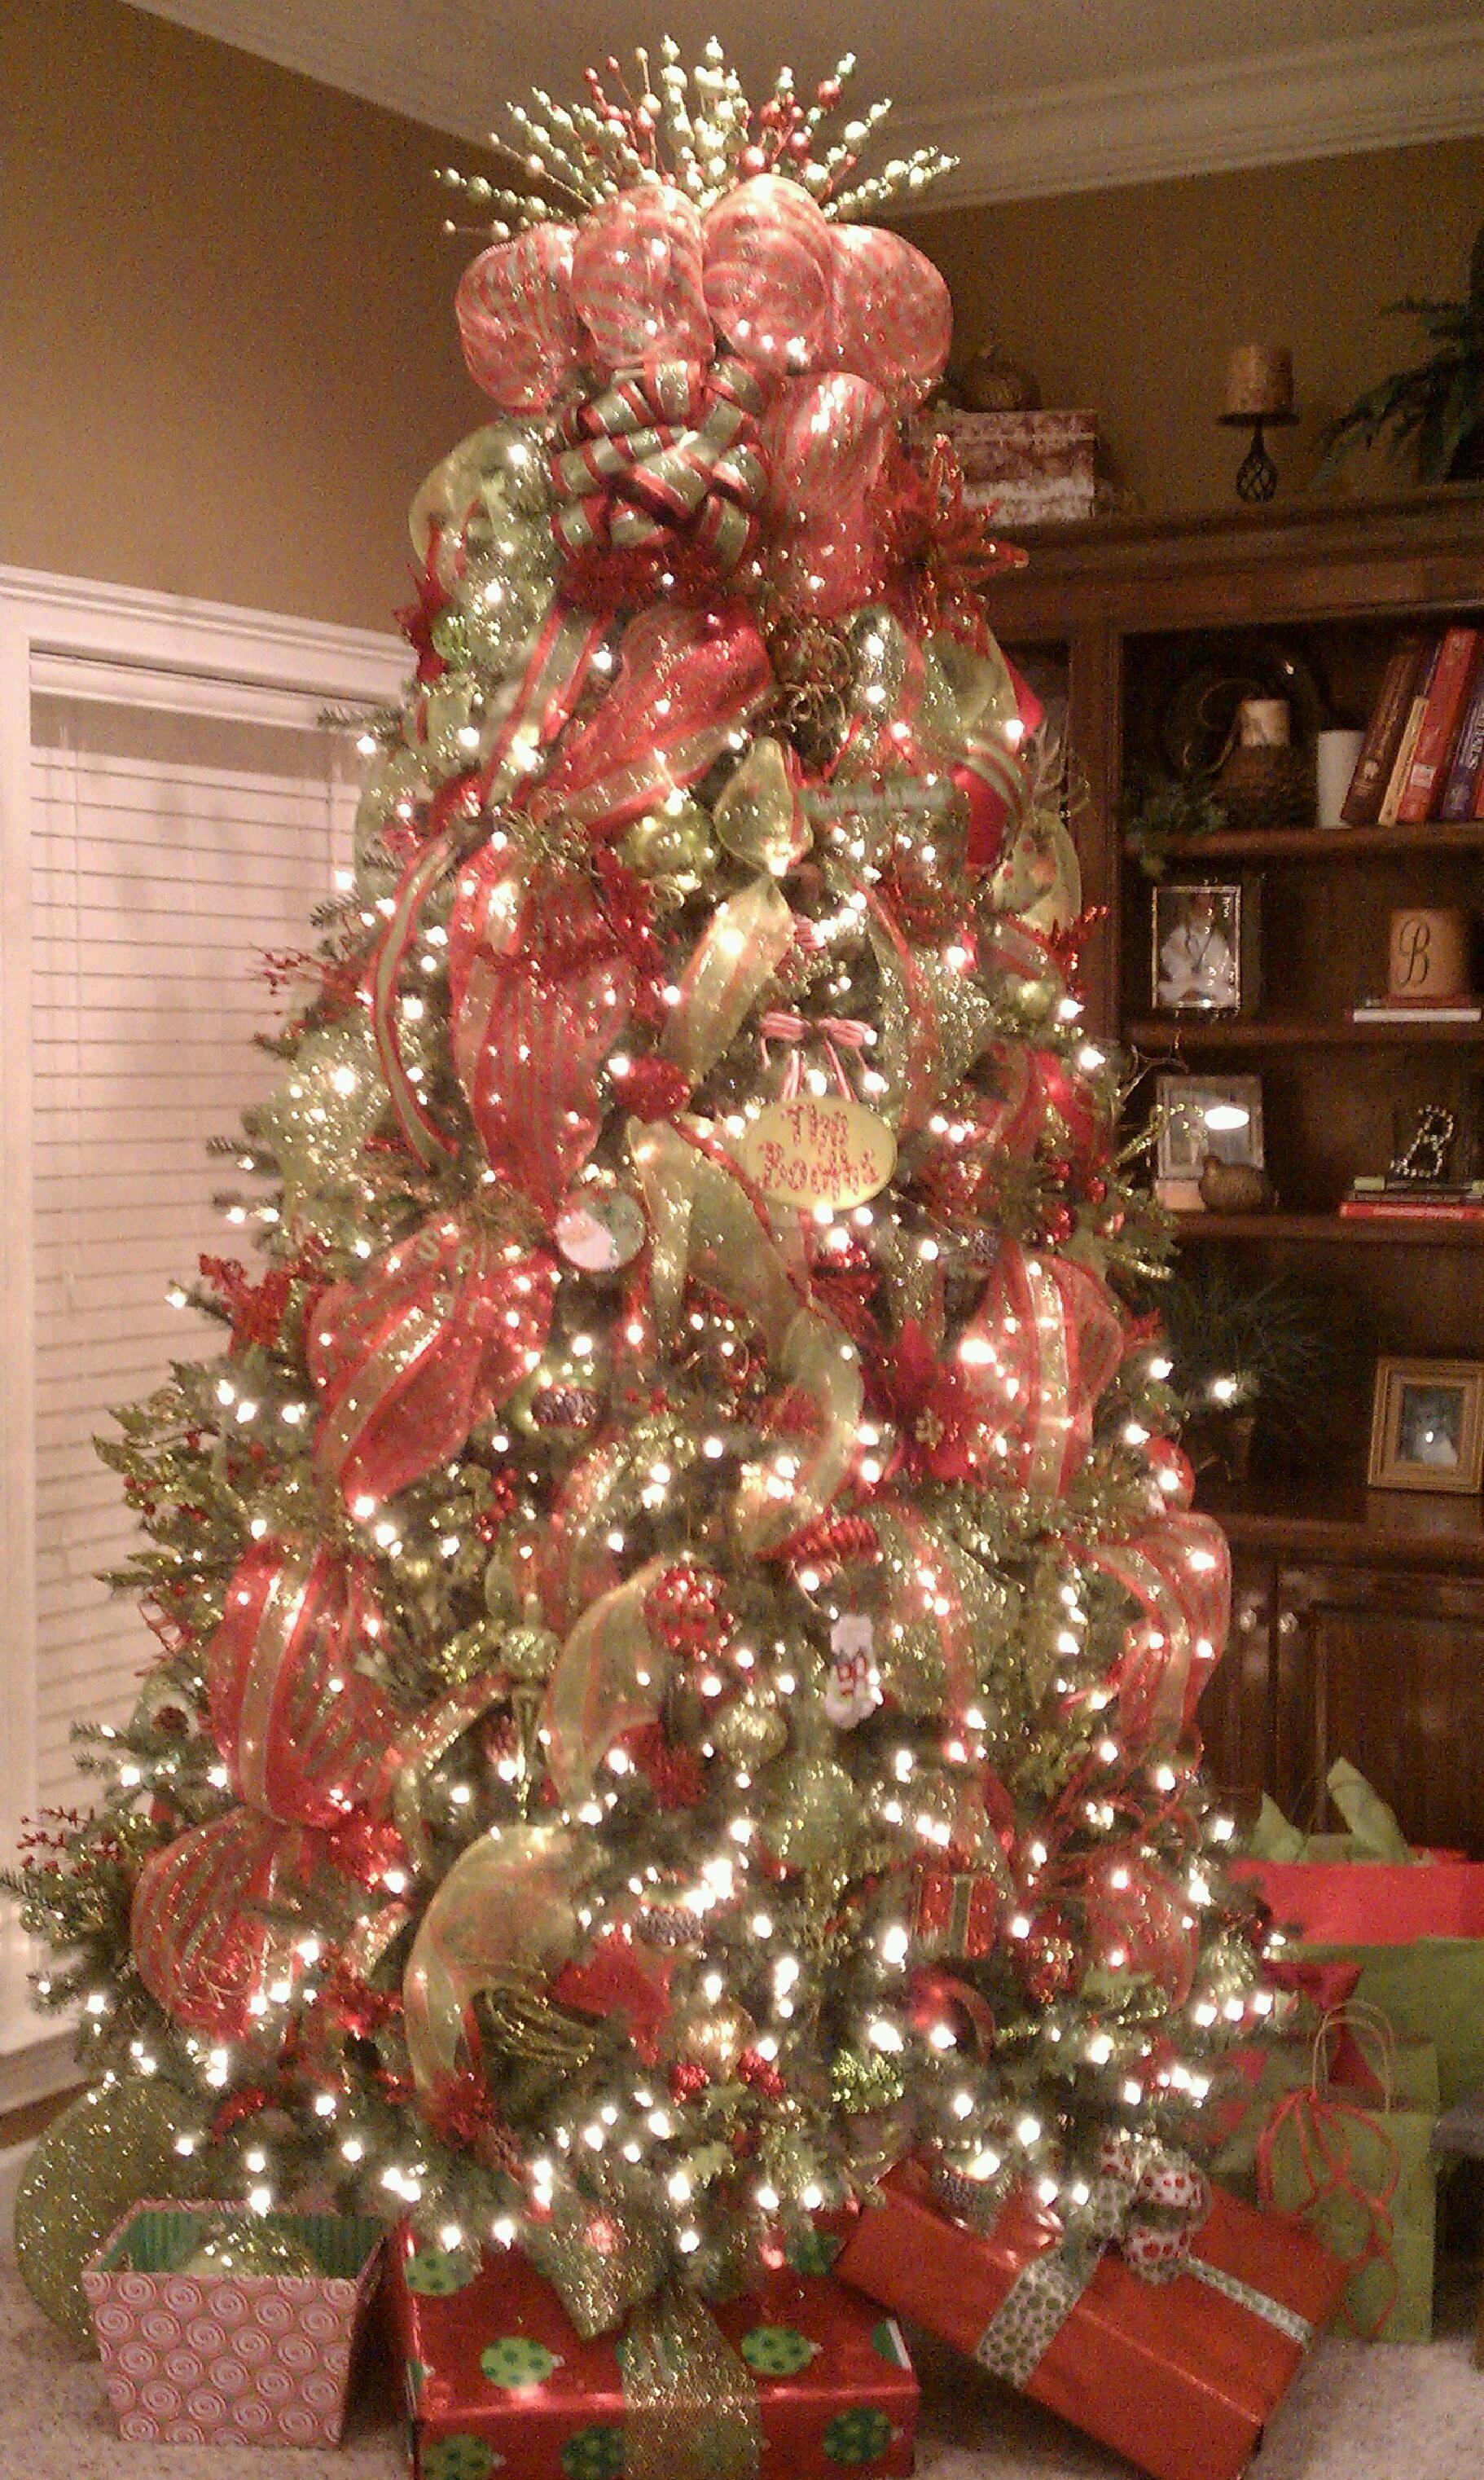 My living room Christmas tree! :)